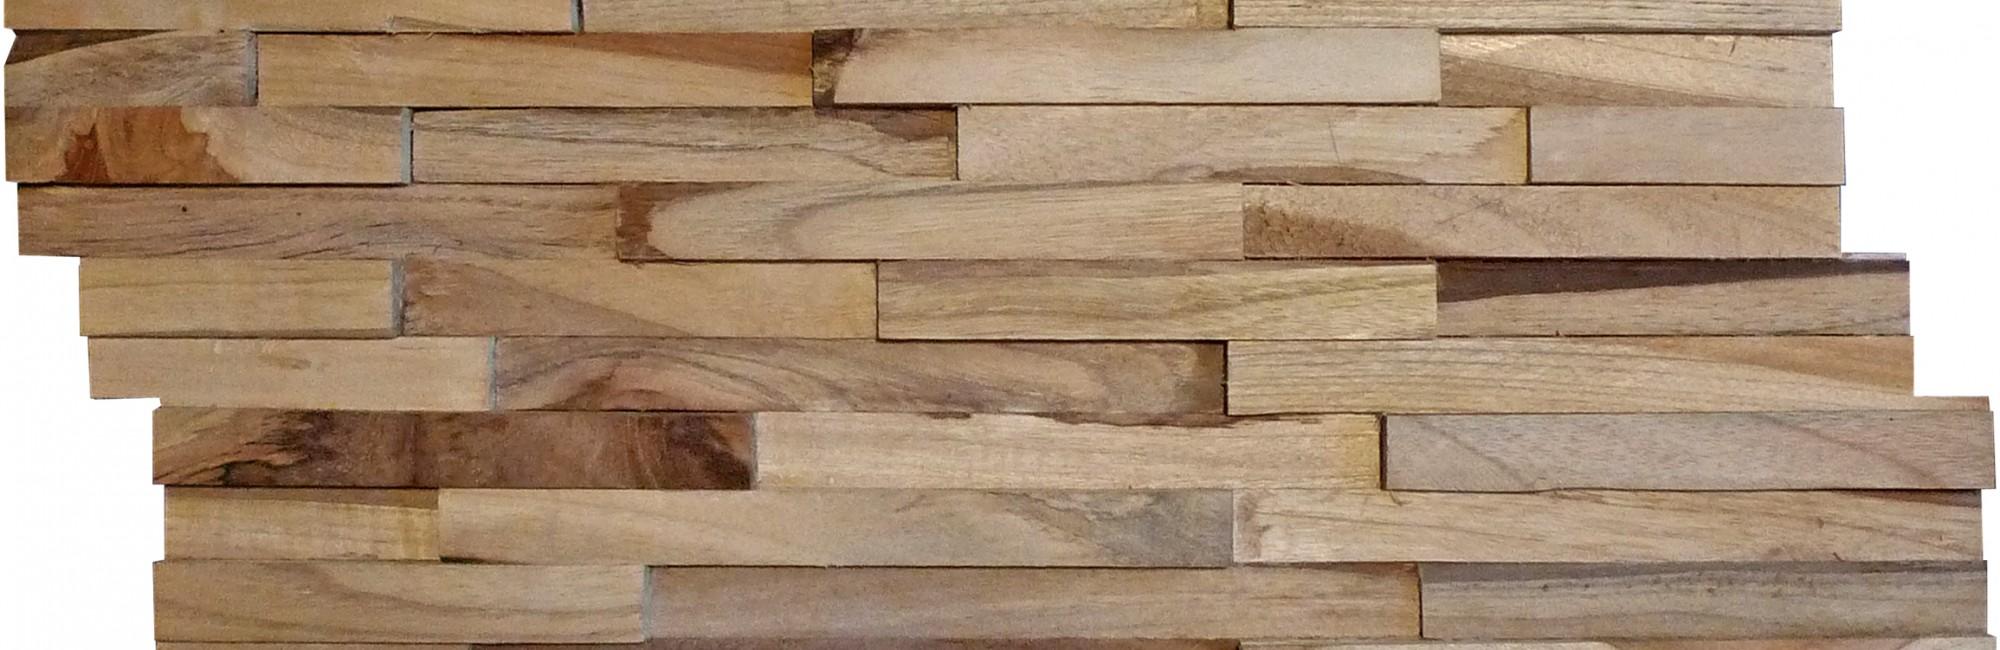 Nieuwe trend: moderne versie van houten wandbekleding - Hornbach ...